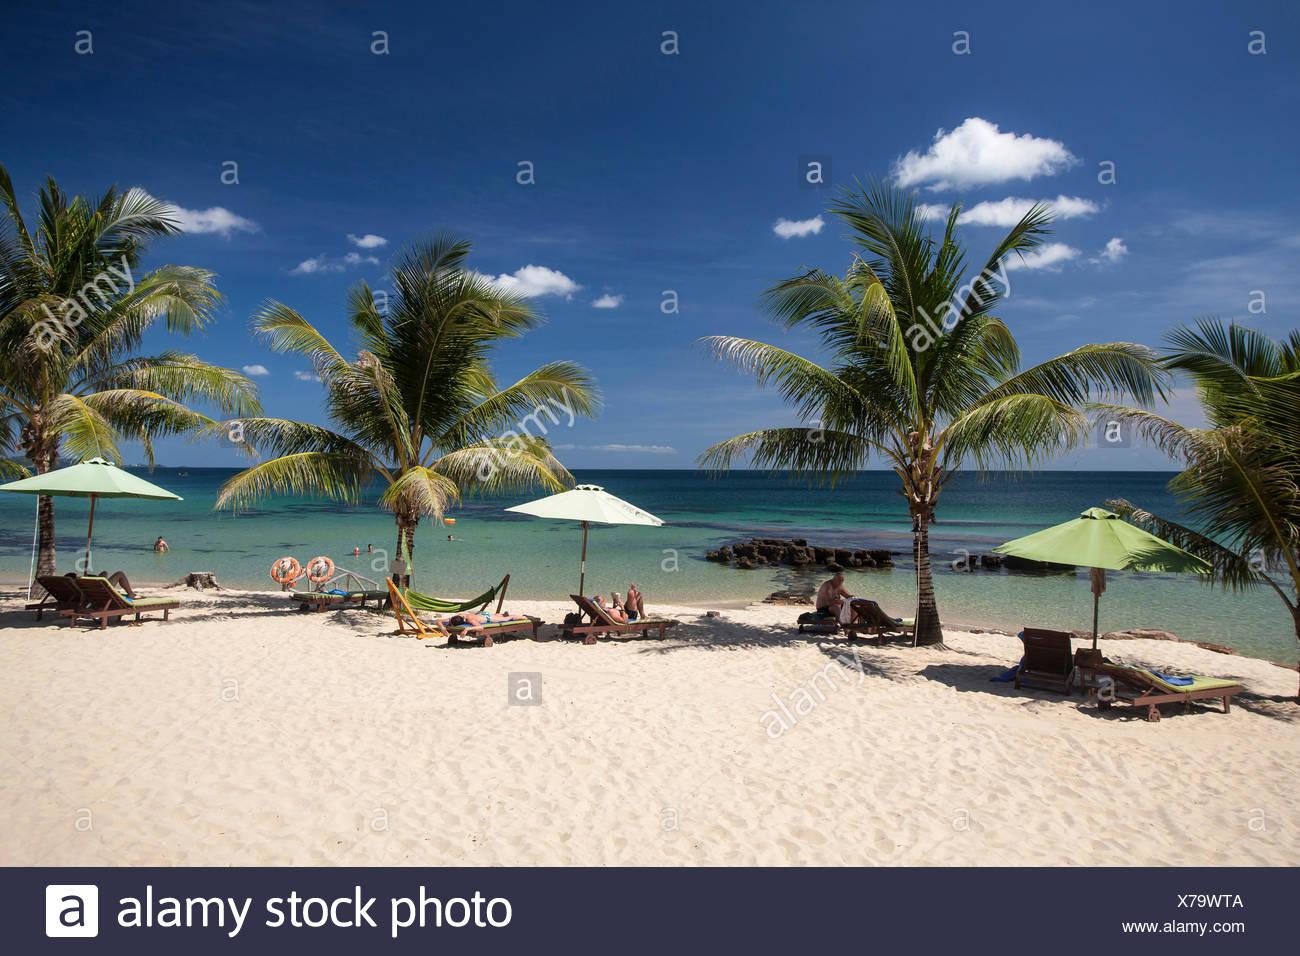 Beach, Seashore, sand beach, palms, palm beach, Eco, Lodge, island, Asian, Asia, outside, island, Phu, Quoc, Resort, South-East A - Stock Image